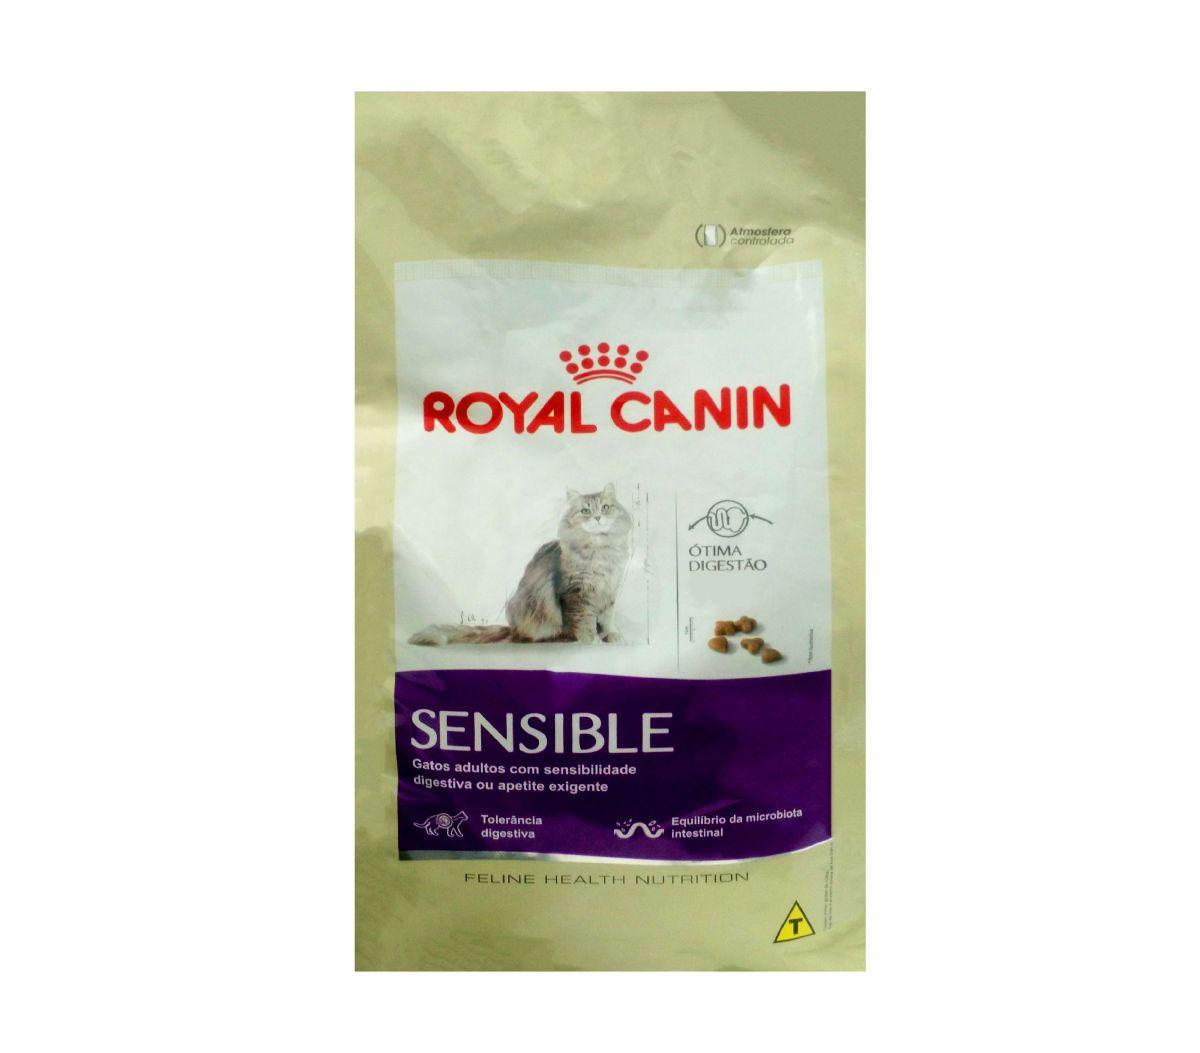 Ração Royal Canin Gatos Sensible